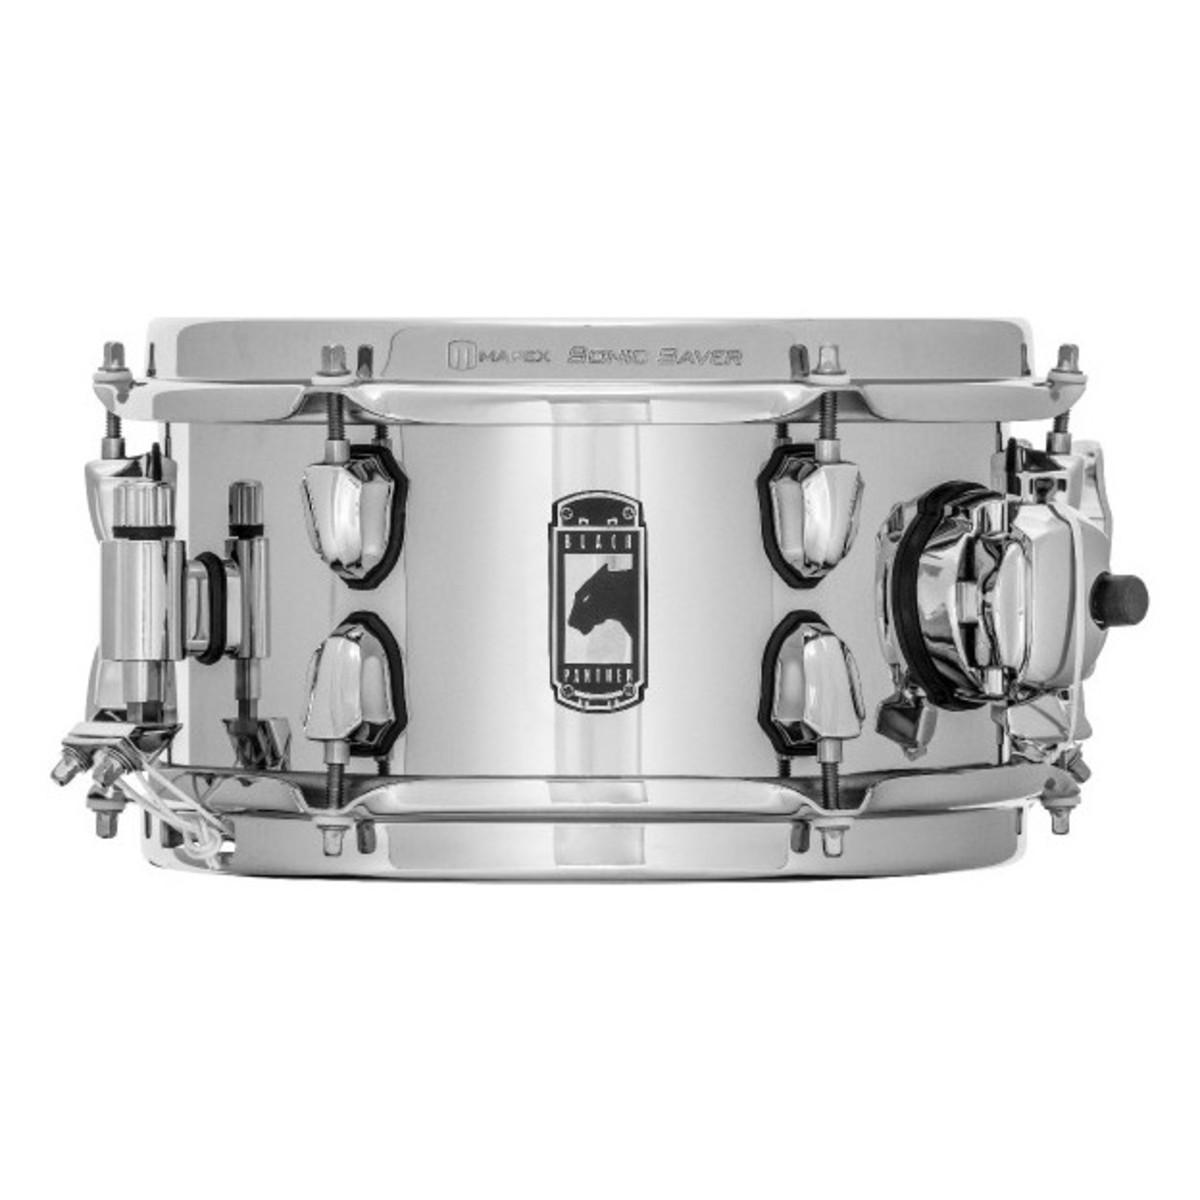 mapex black panther the stinger 10 x 5 5 steel snare drum at gear4music. Black Bedroom Furniture Sets. Home Design Ideas